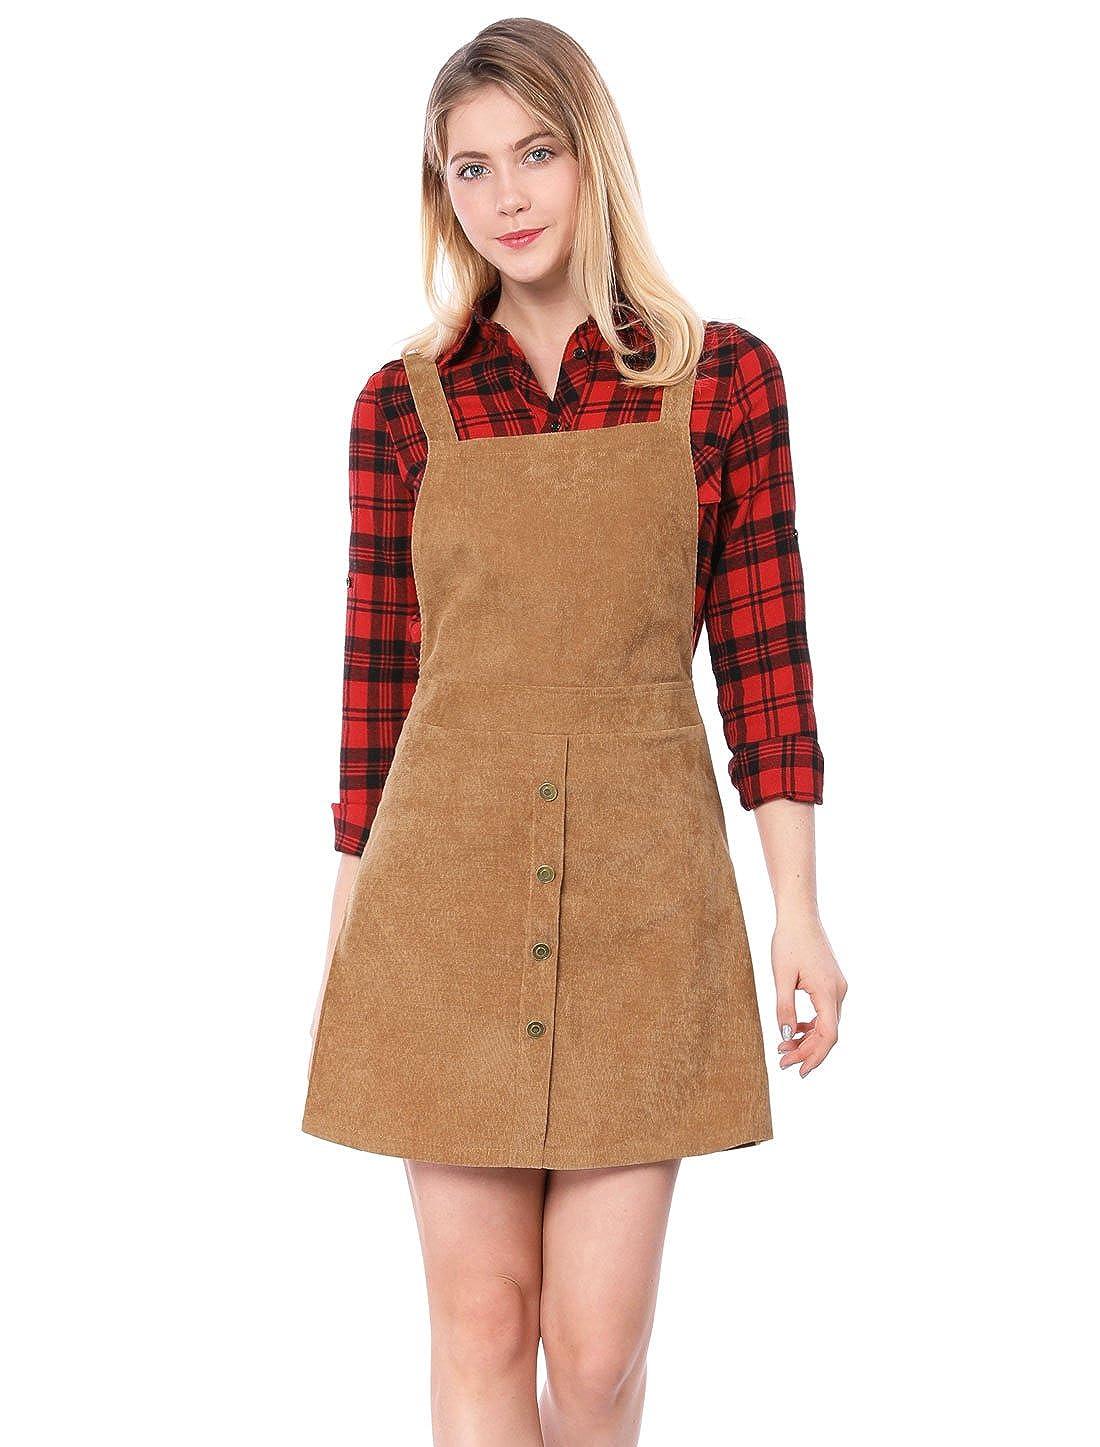 Allegra K Women's Corduroy Button Decor A Line Suspender Overall Skirt Dress s18040900it0783